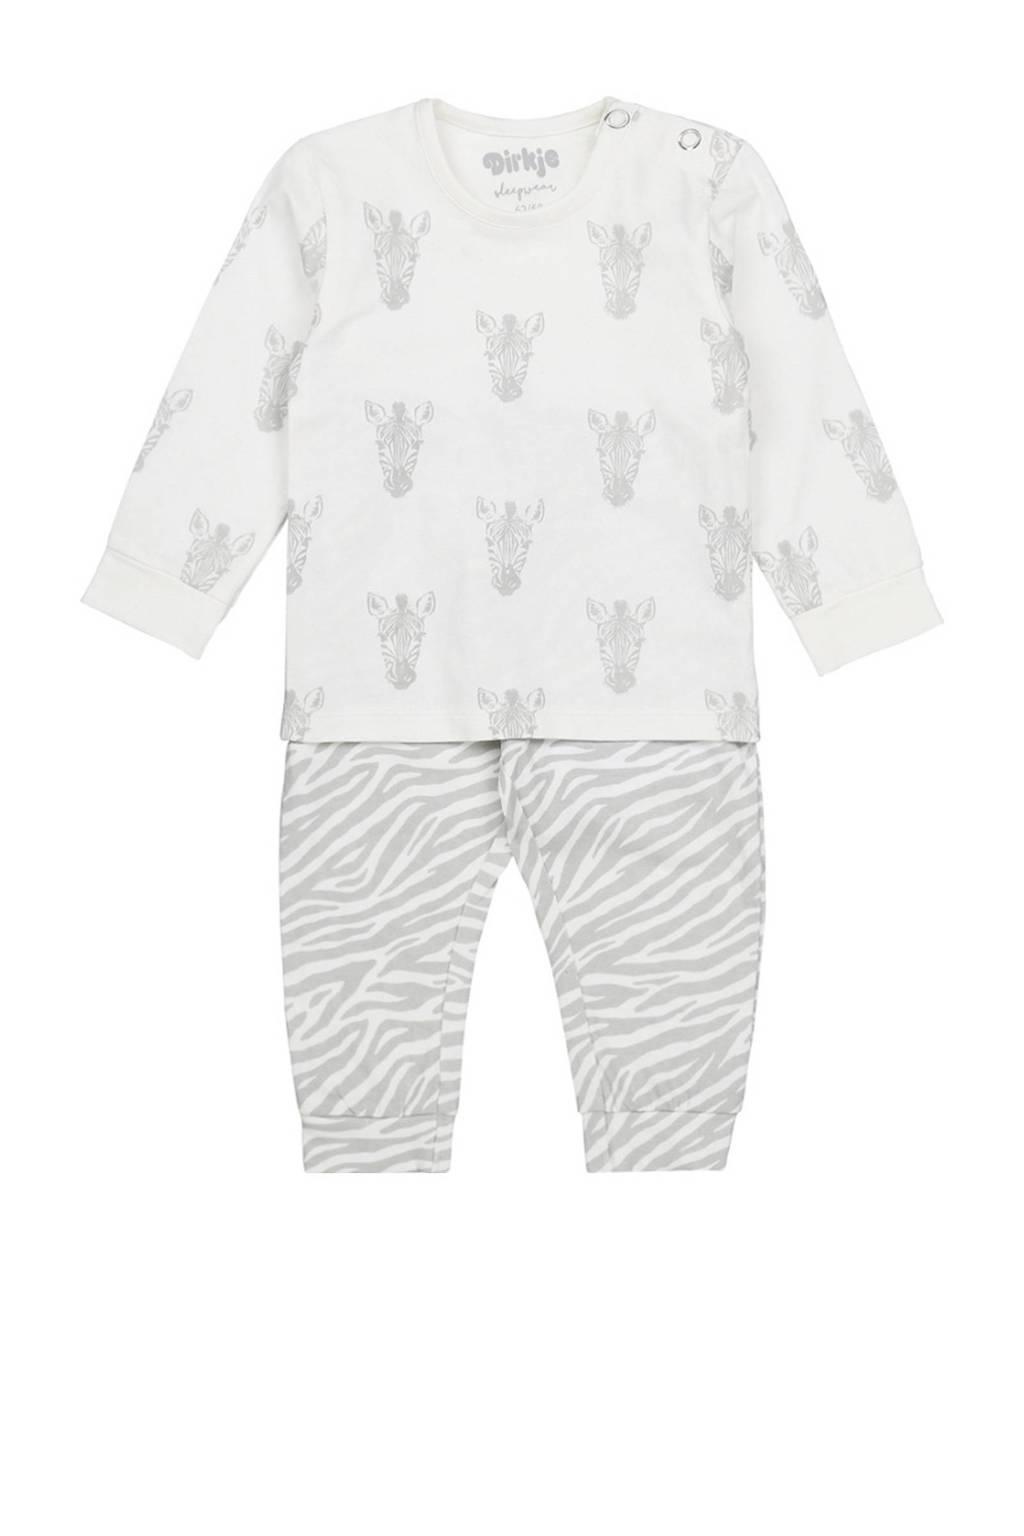 Dirkje pyjama wit/grijs, Wit